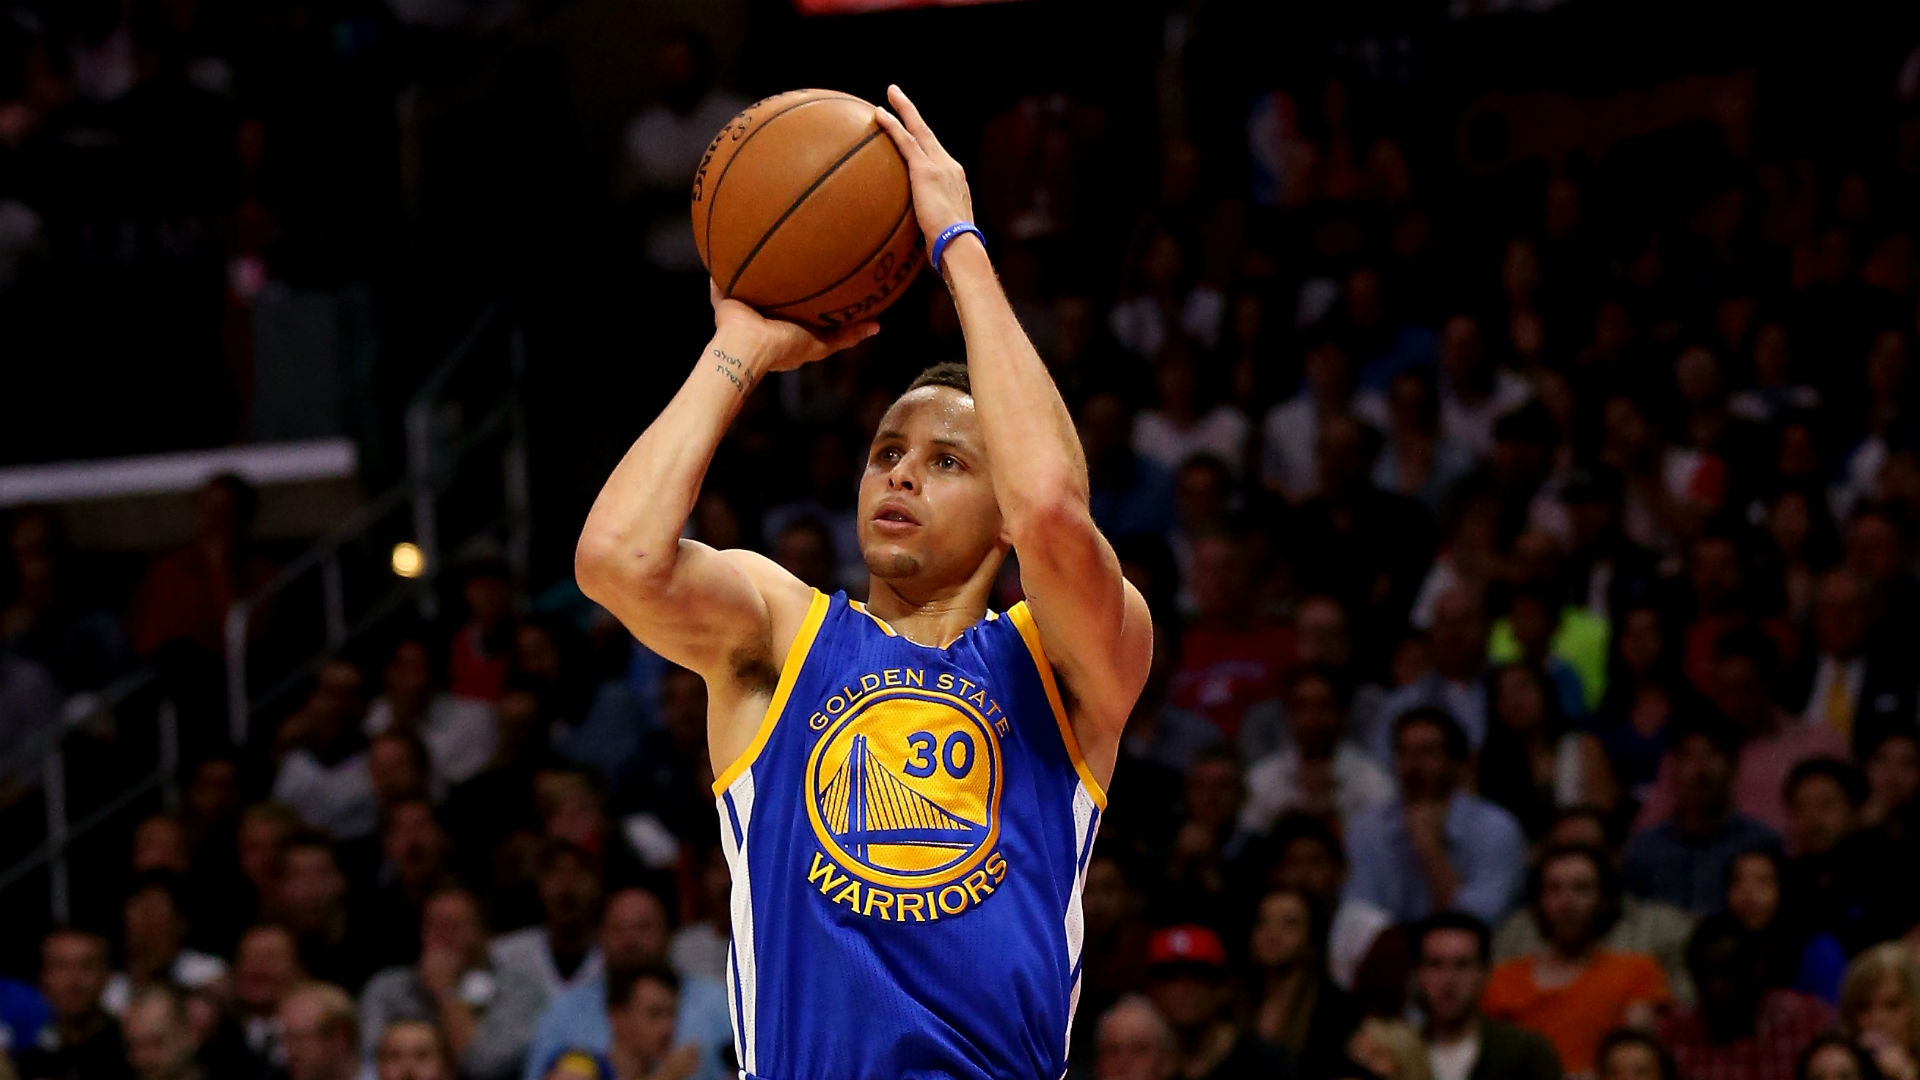 Steely Warriors sweep off Spurs to reach third-straight NBA finals